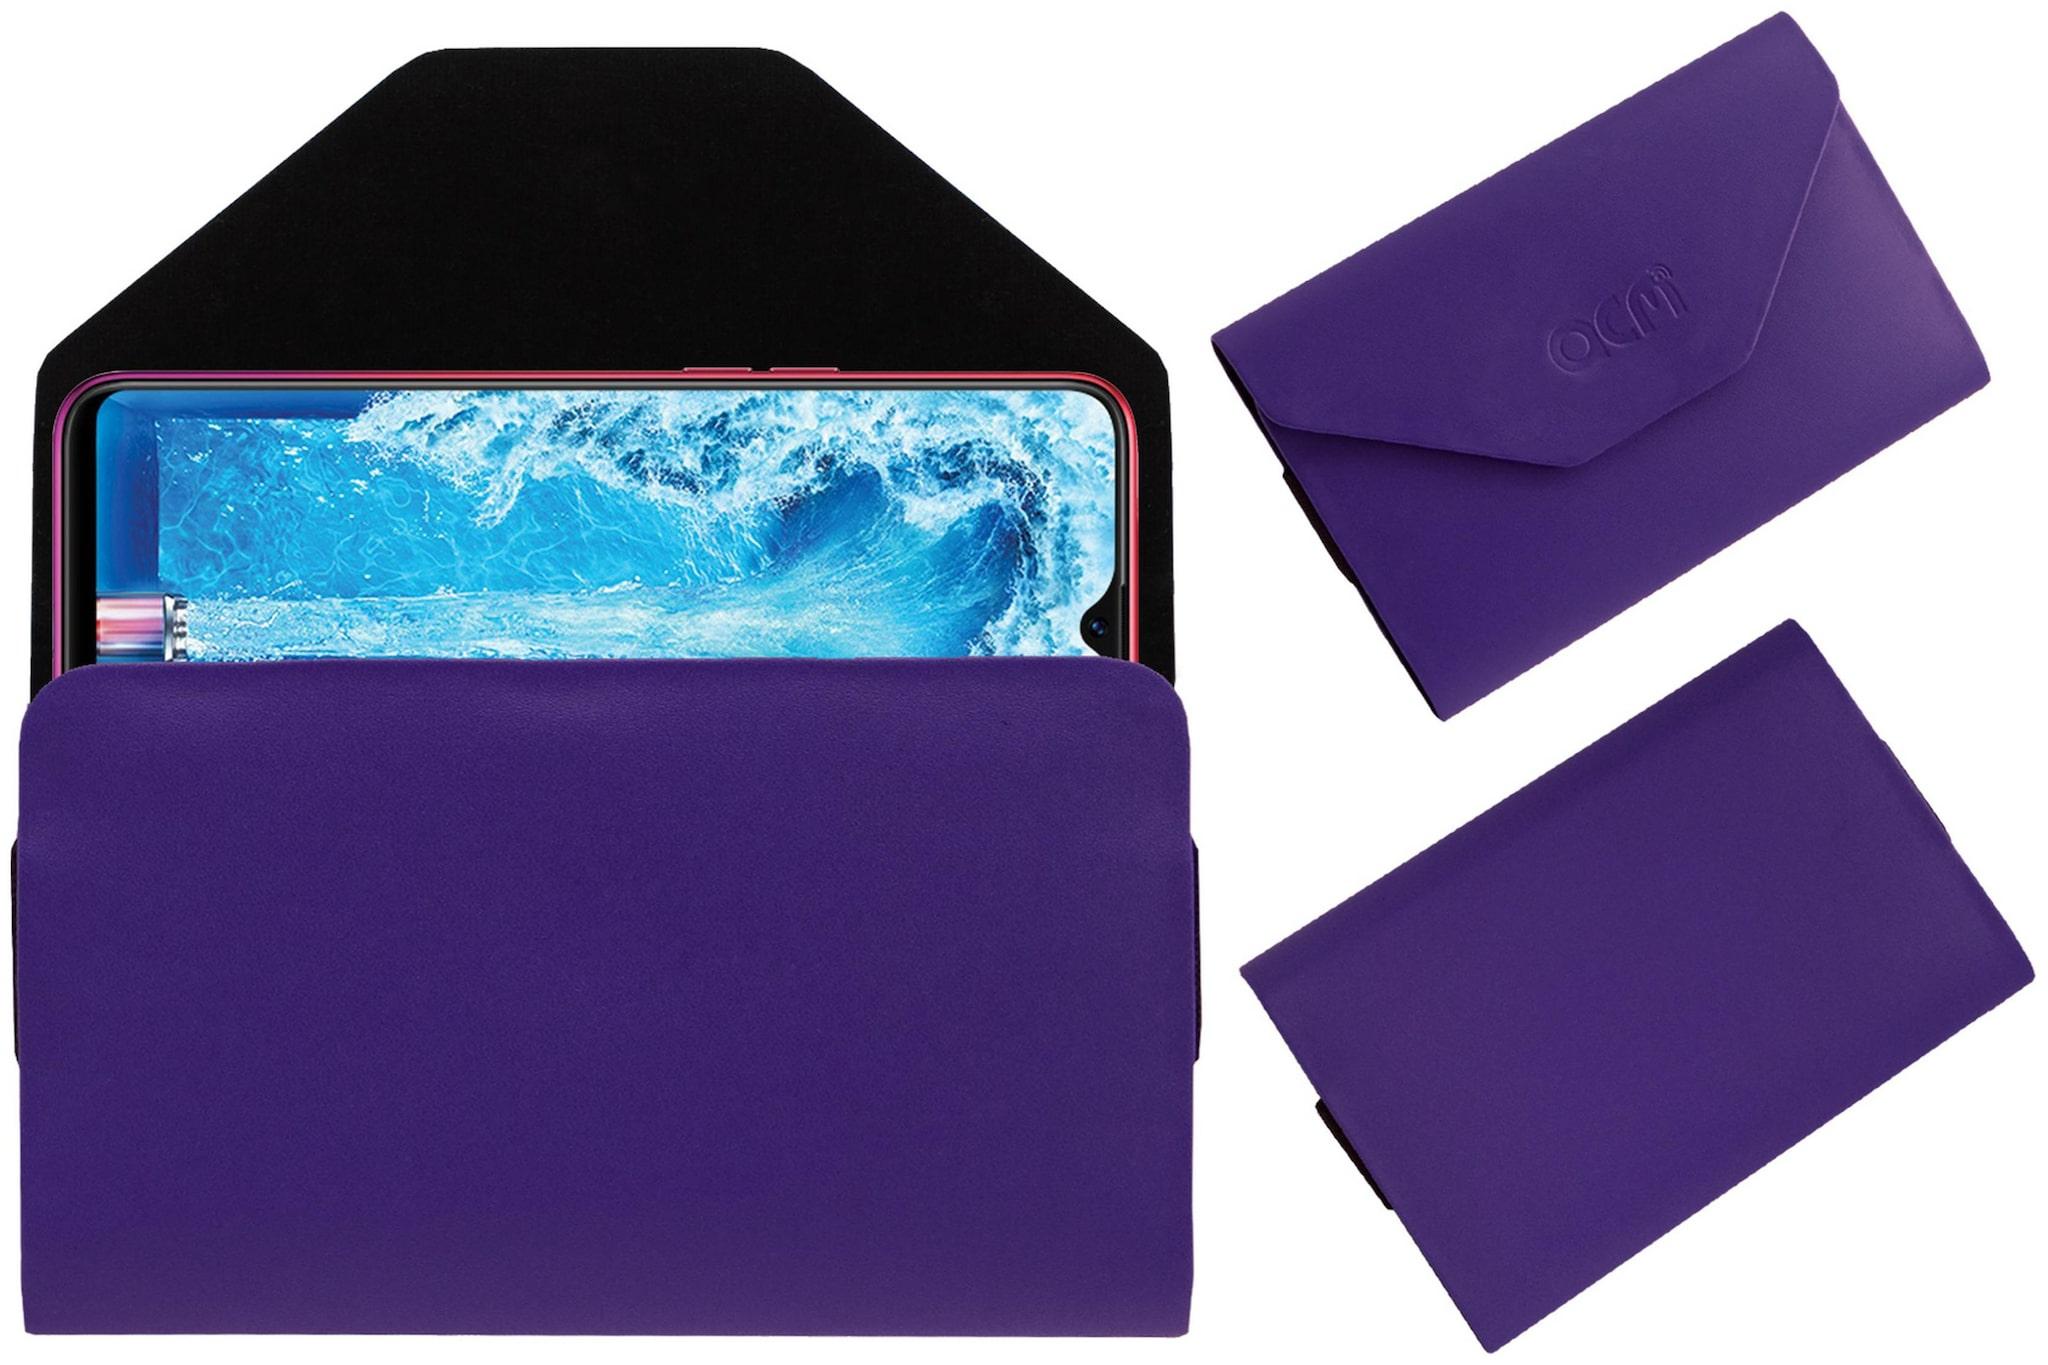 Acm Premium Flip Flap Pouch Case for Oppo F9 Pro Cph1823 Mobile Leather Cover Purple